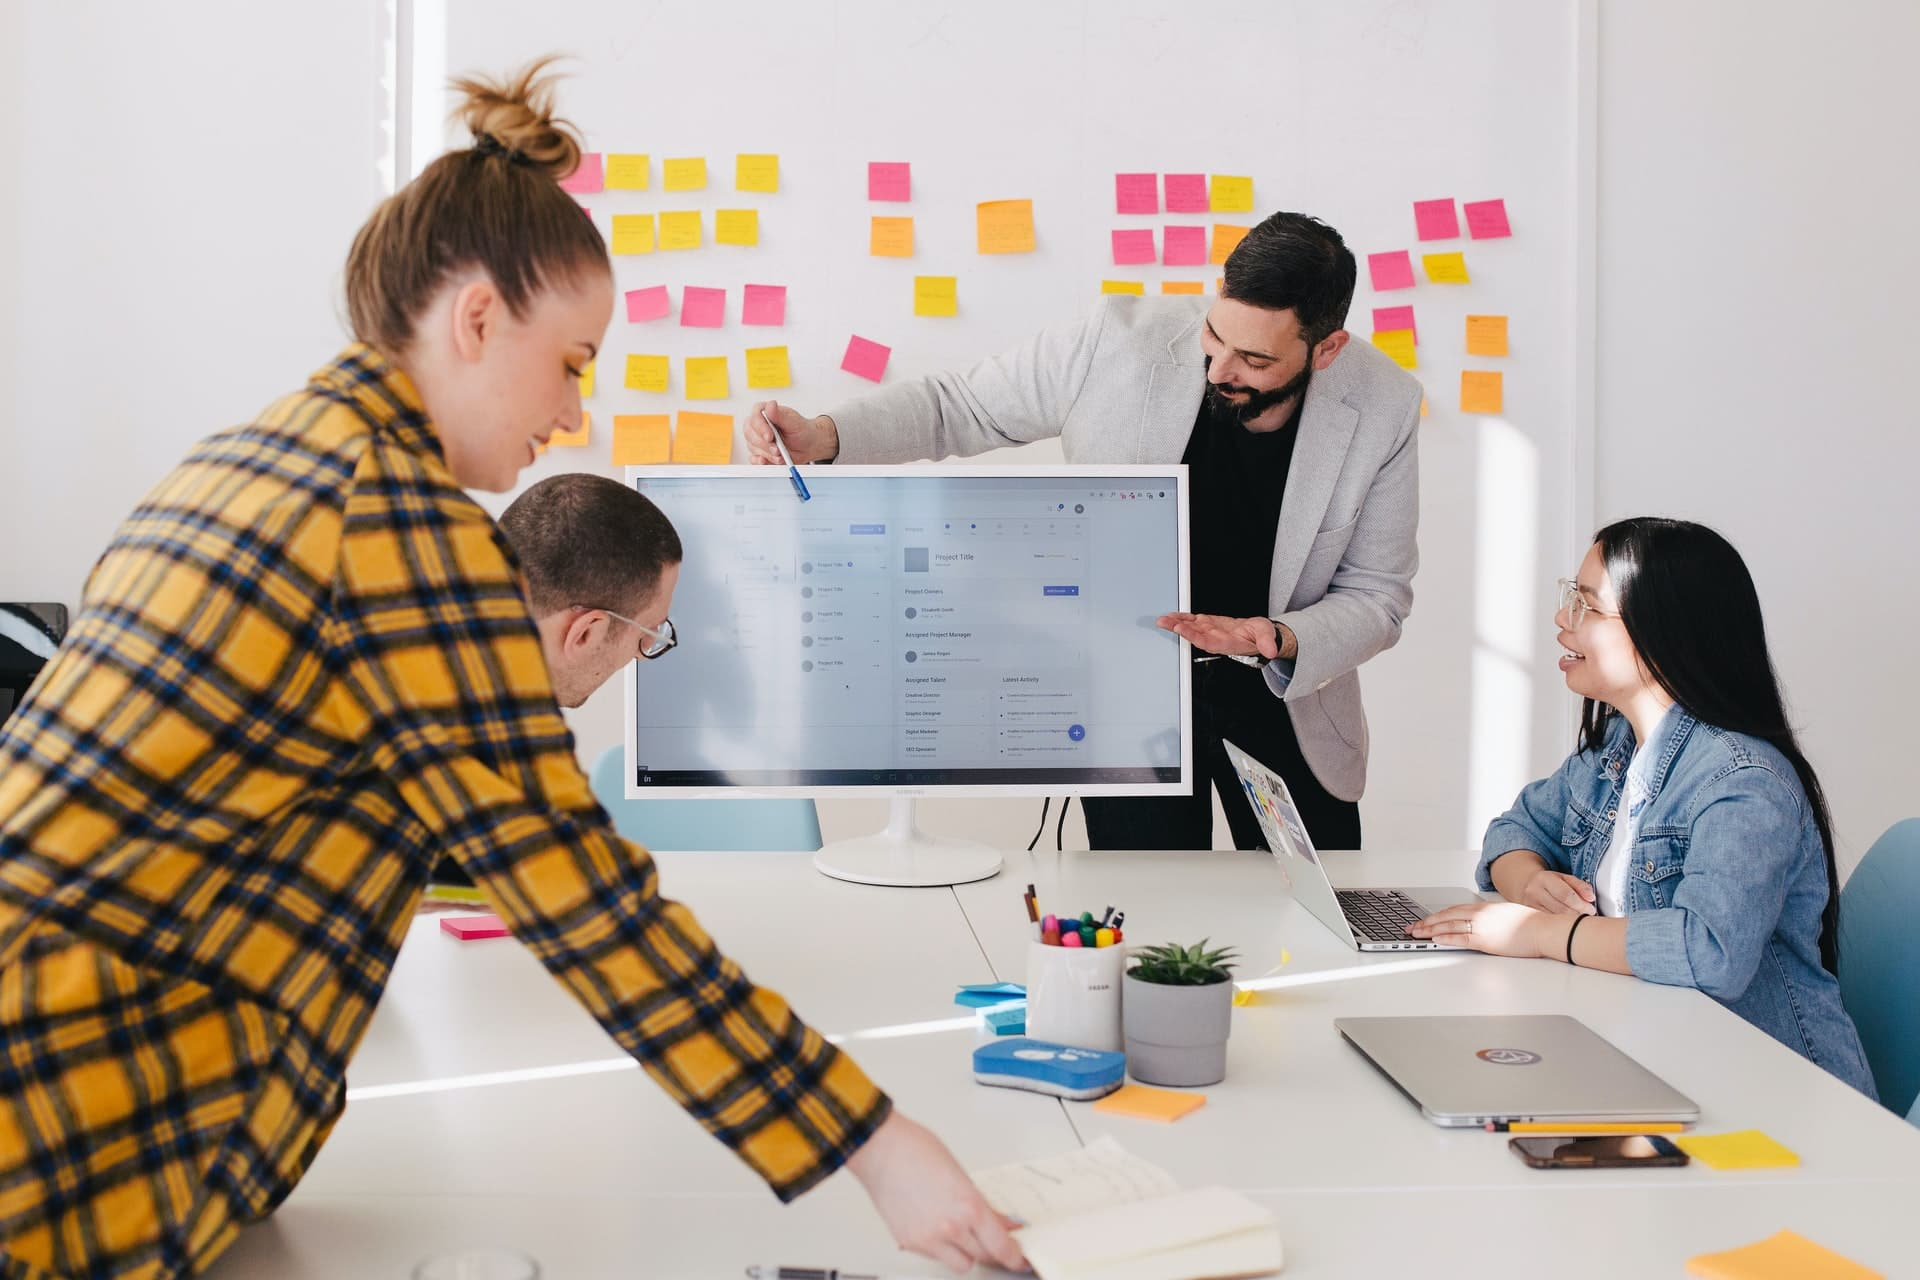 business intelligence mit kwsoft BI meeting analyse